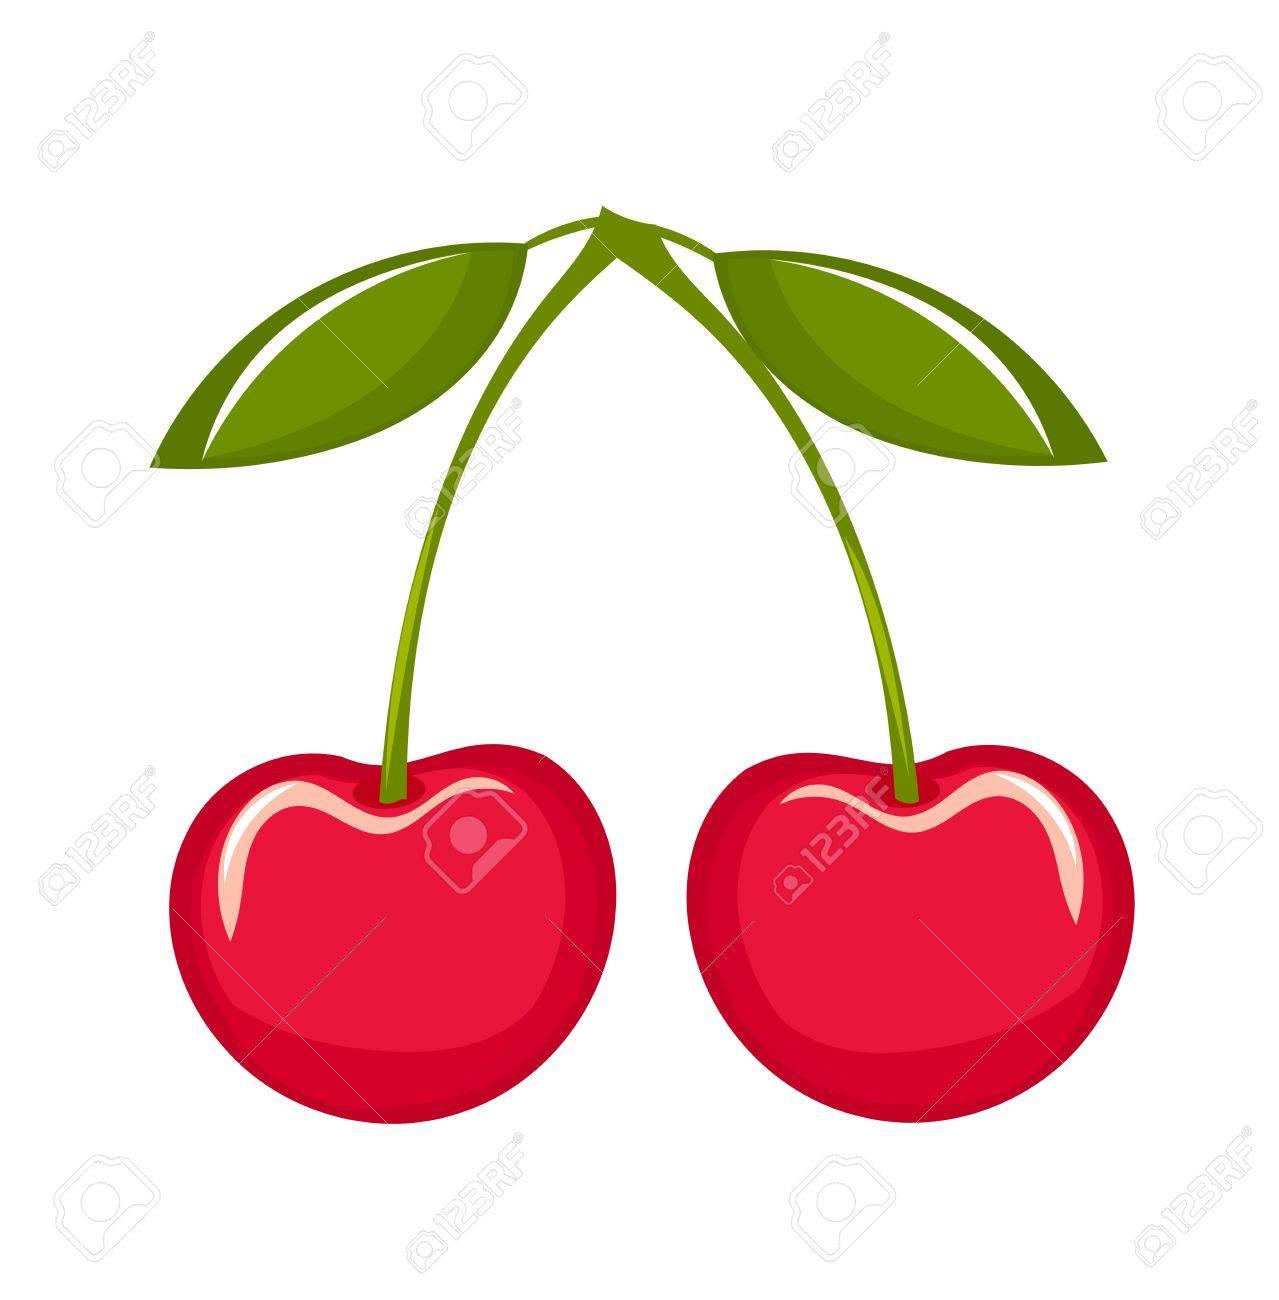 Delicious cherries over white. Stock Vector - 9584350